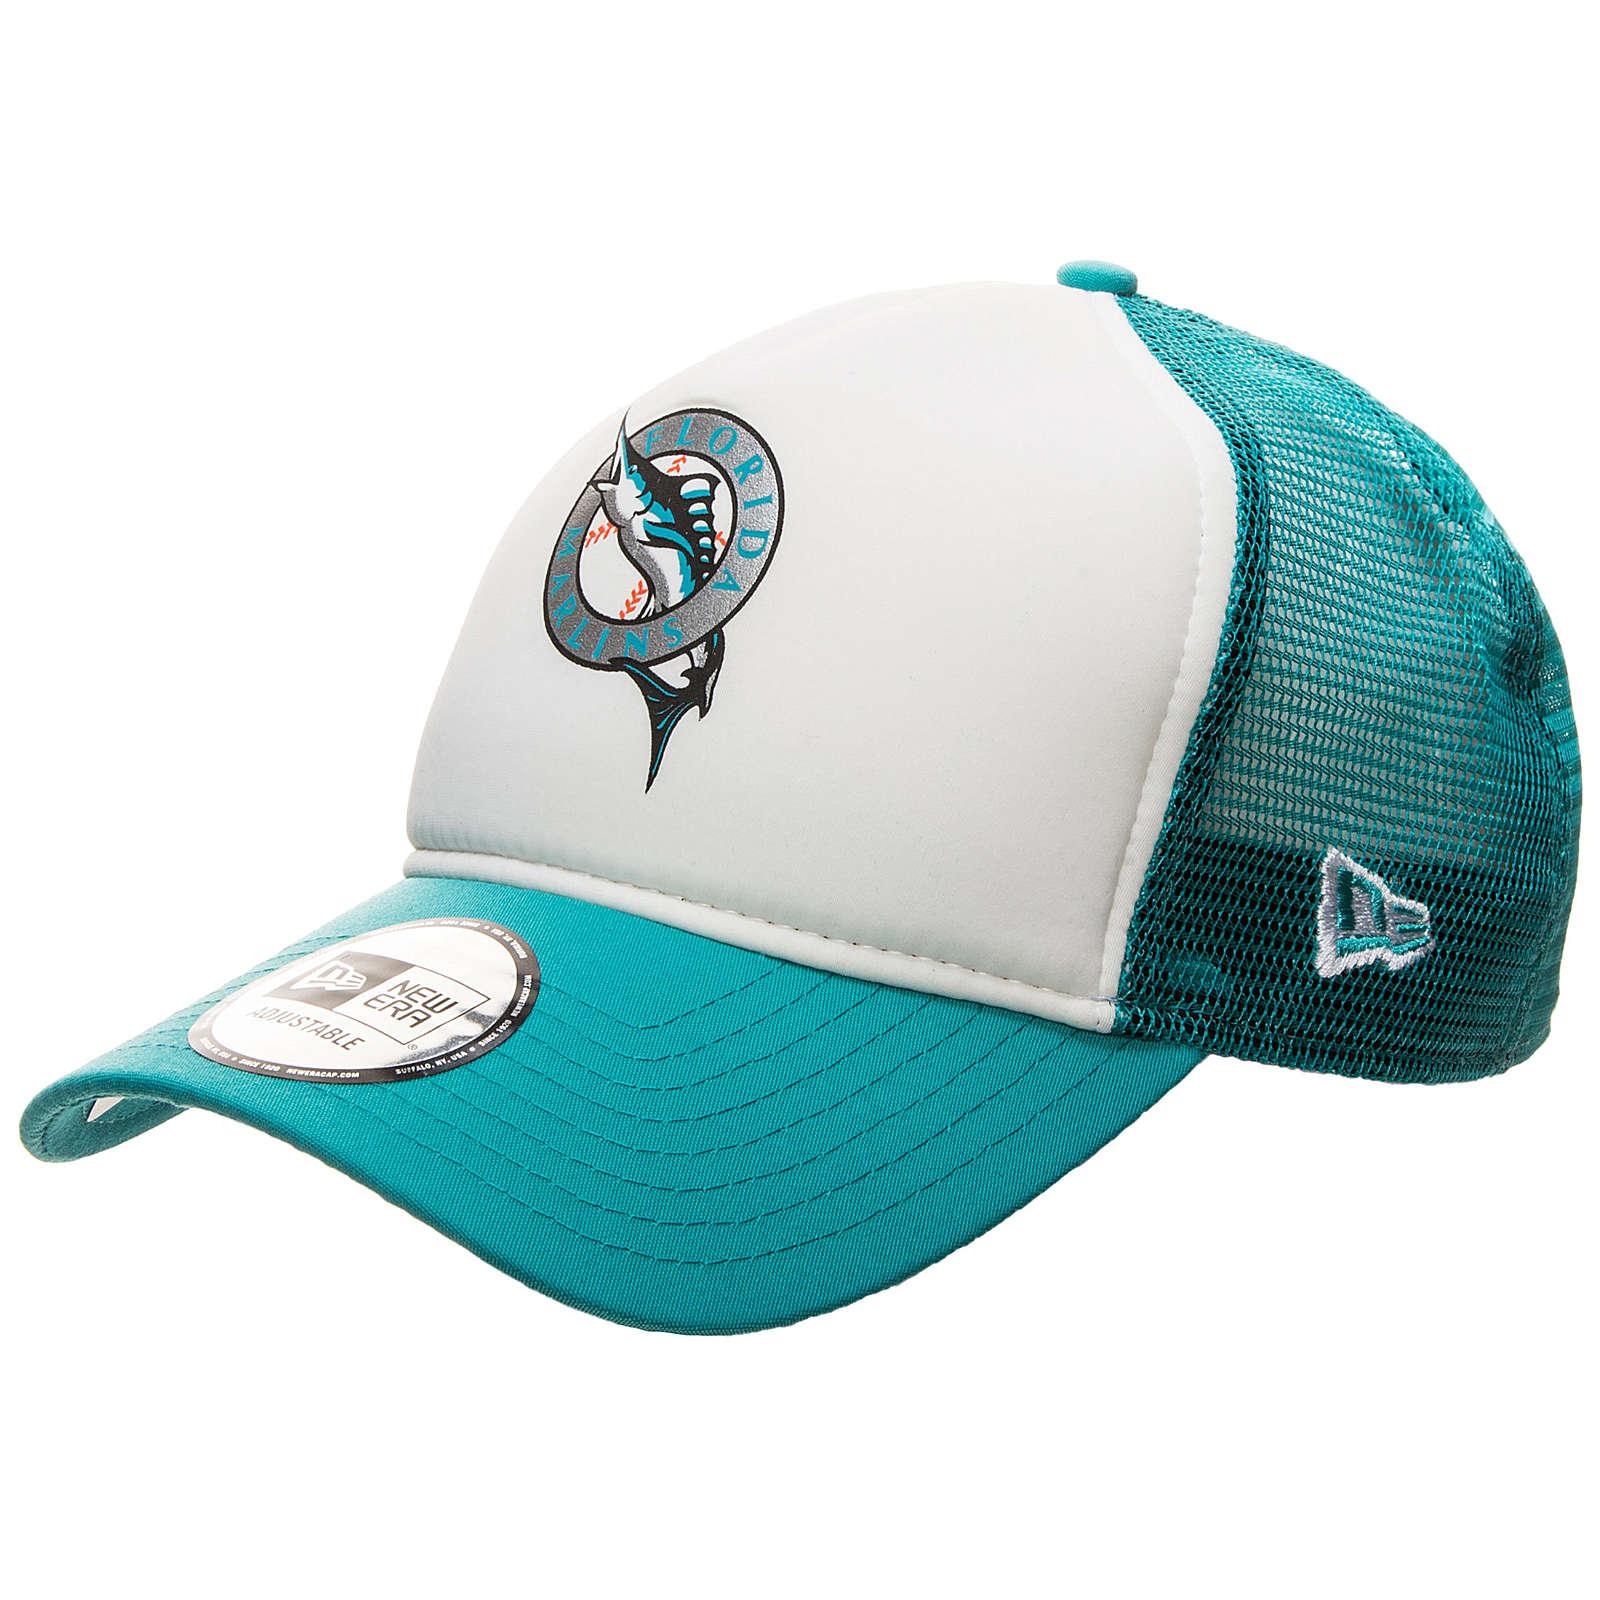 New Era 9FORTY MLB Miami Marlins Trucker Caps g...